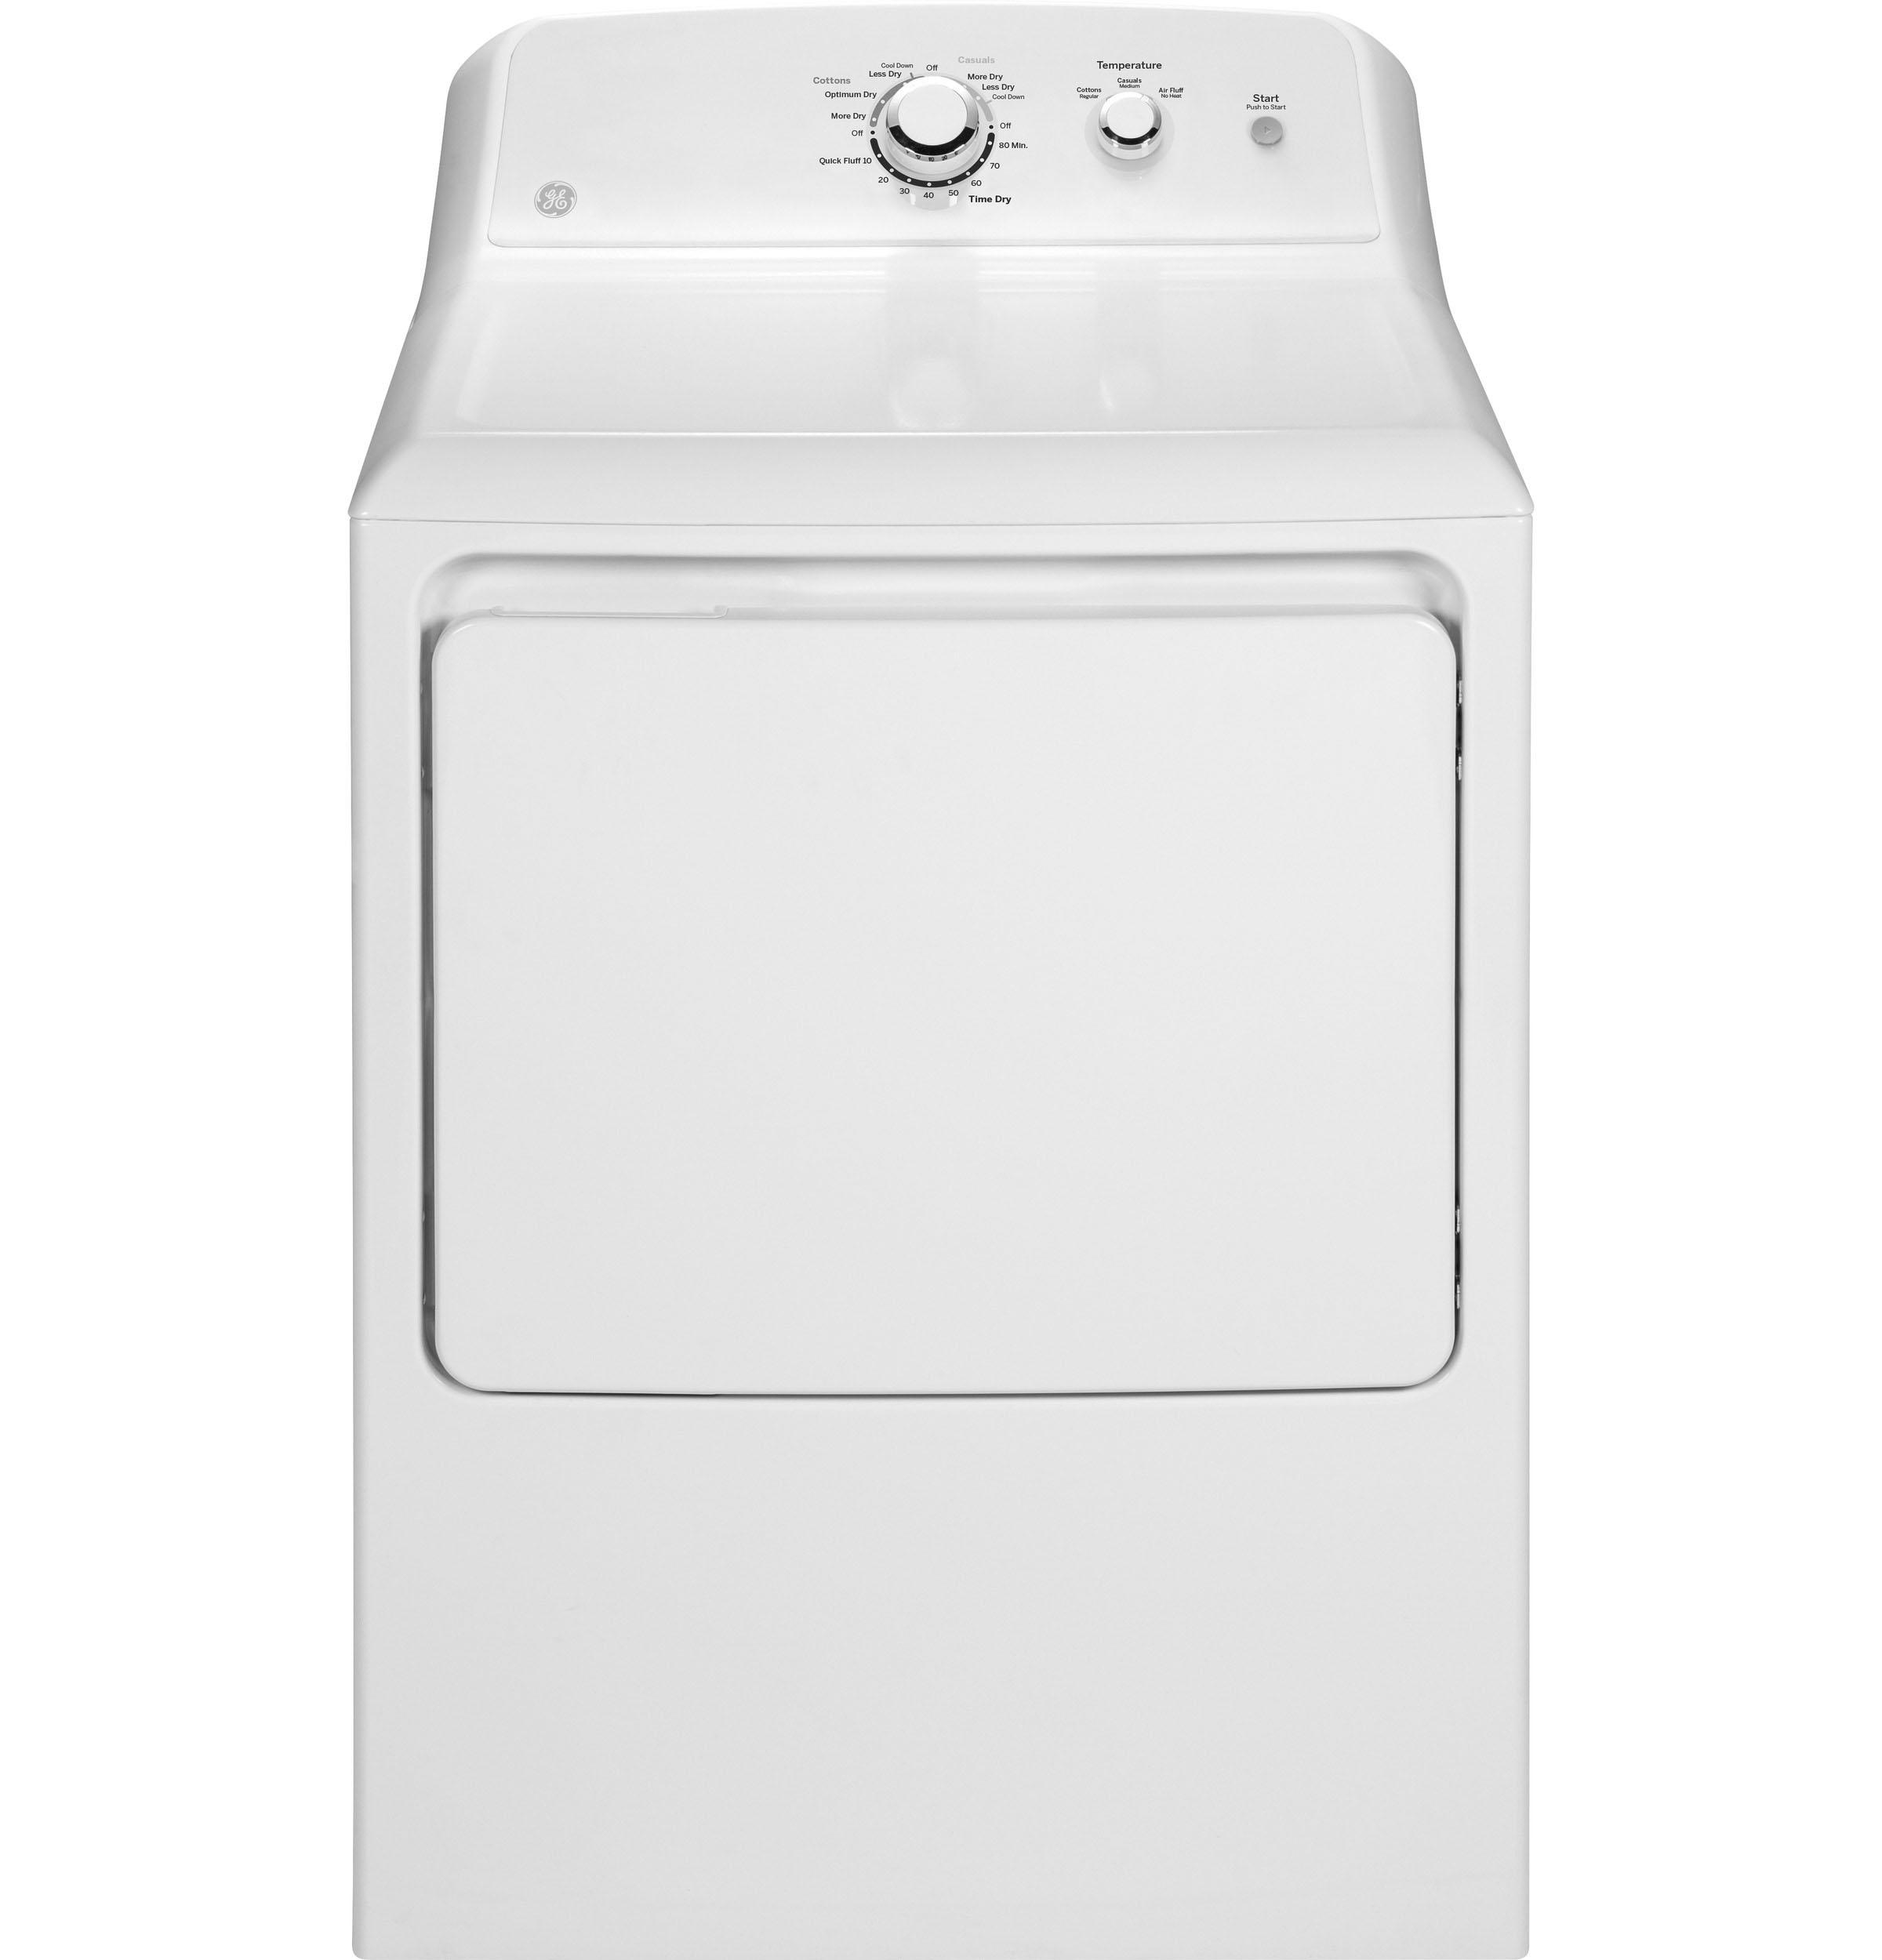 Ge 174 Front Load Gas Dryer White Gtd33gaskww Kitchen